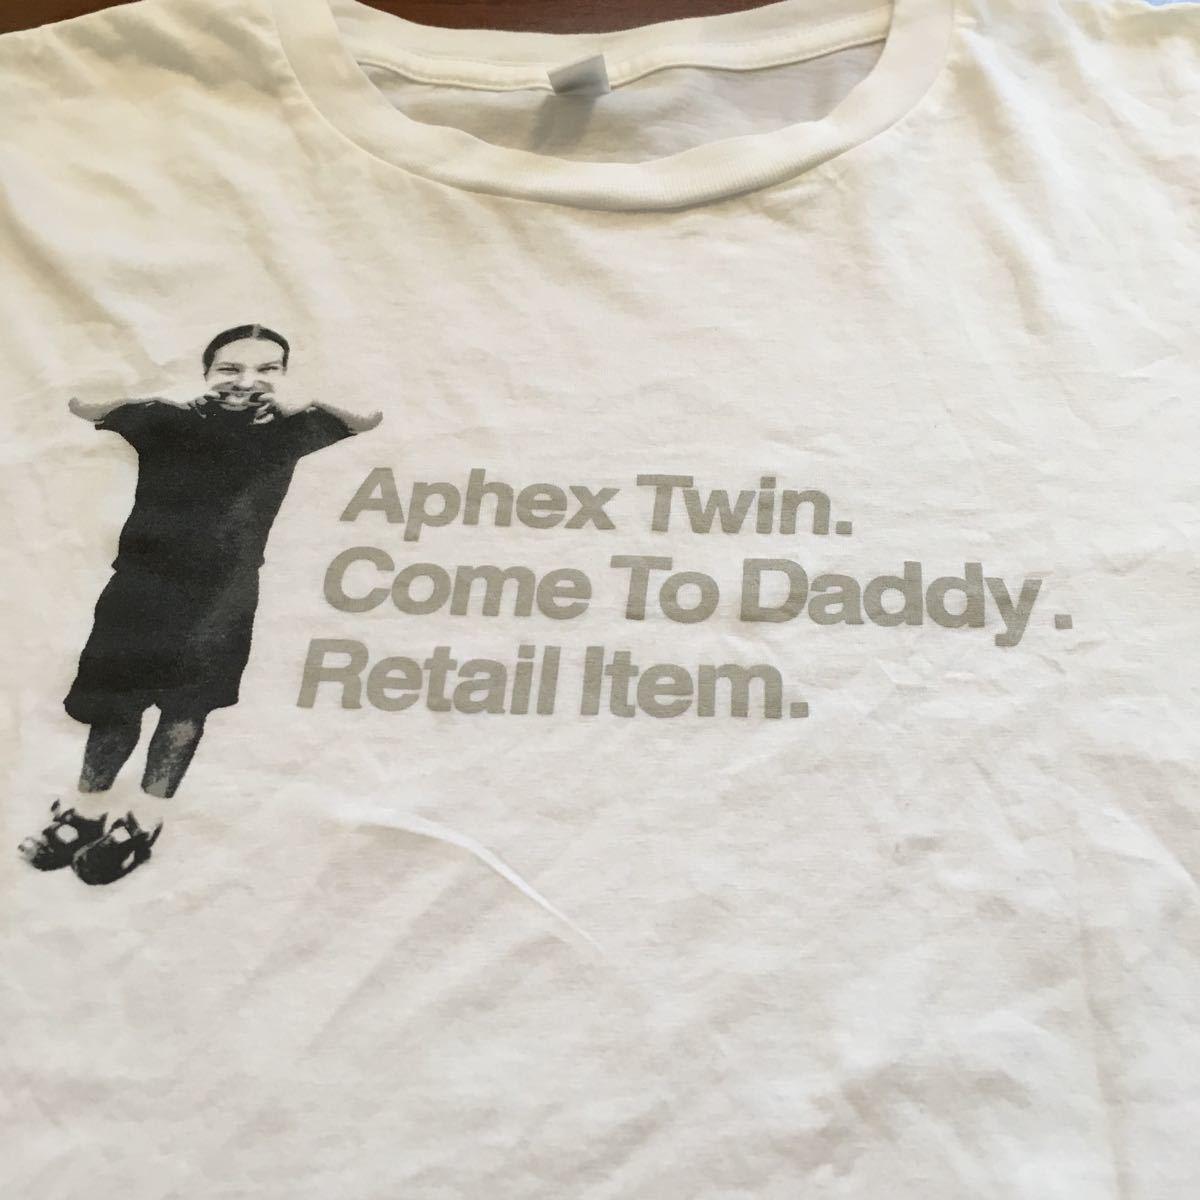 Aphex Twin エイフェックスツイン 半袖Tシャツ Mサイズ 公式グッズ 海外公式サイト購入_画像2